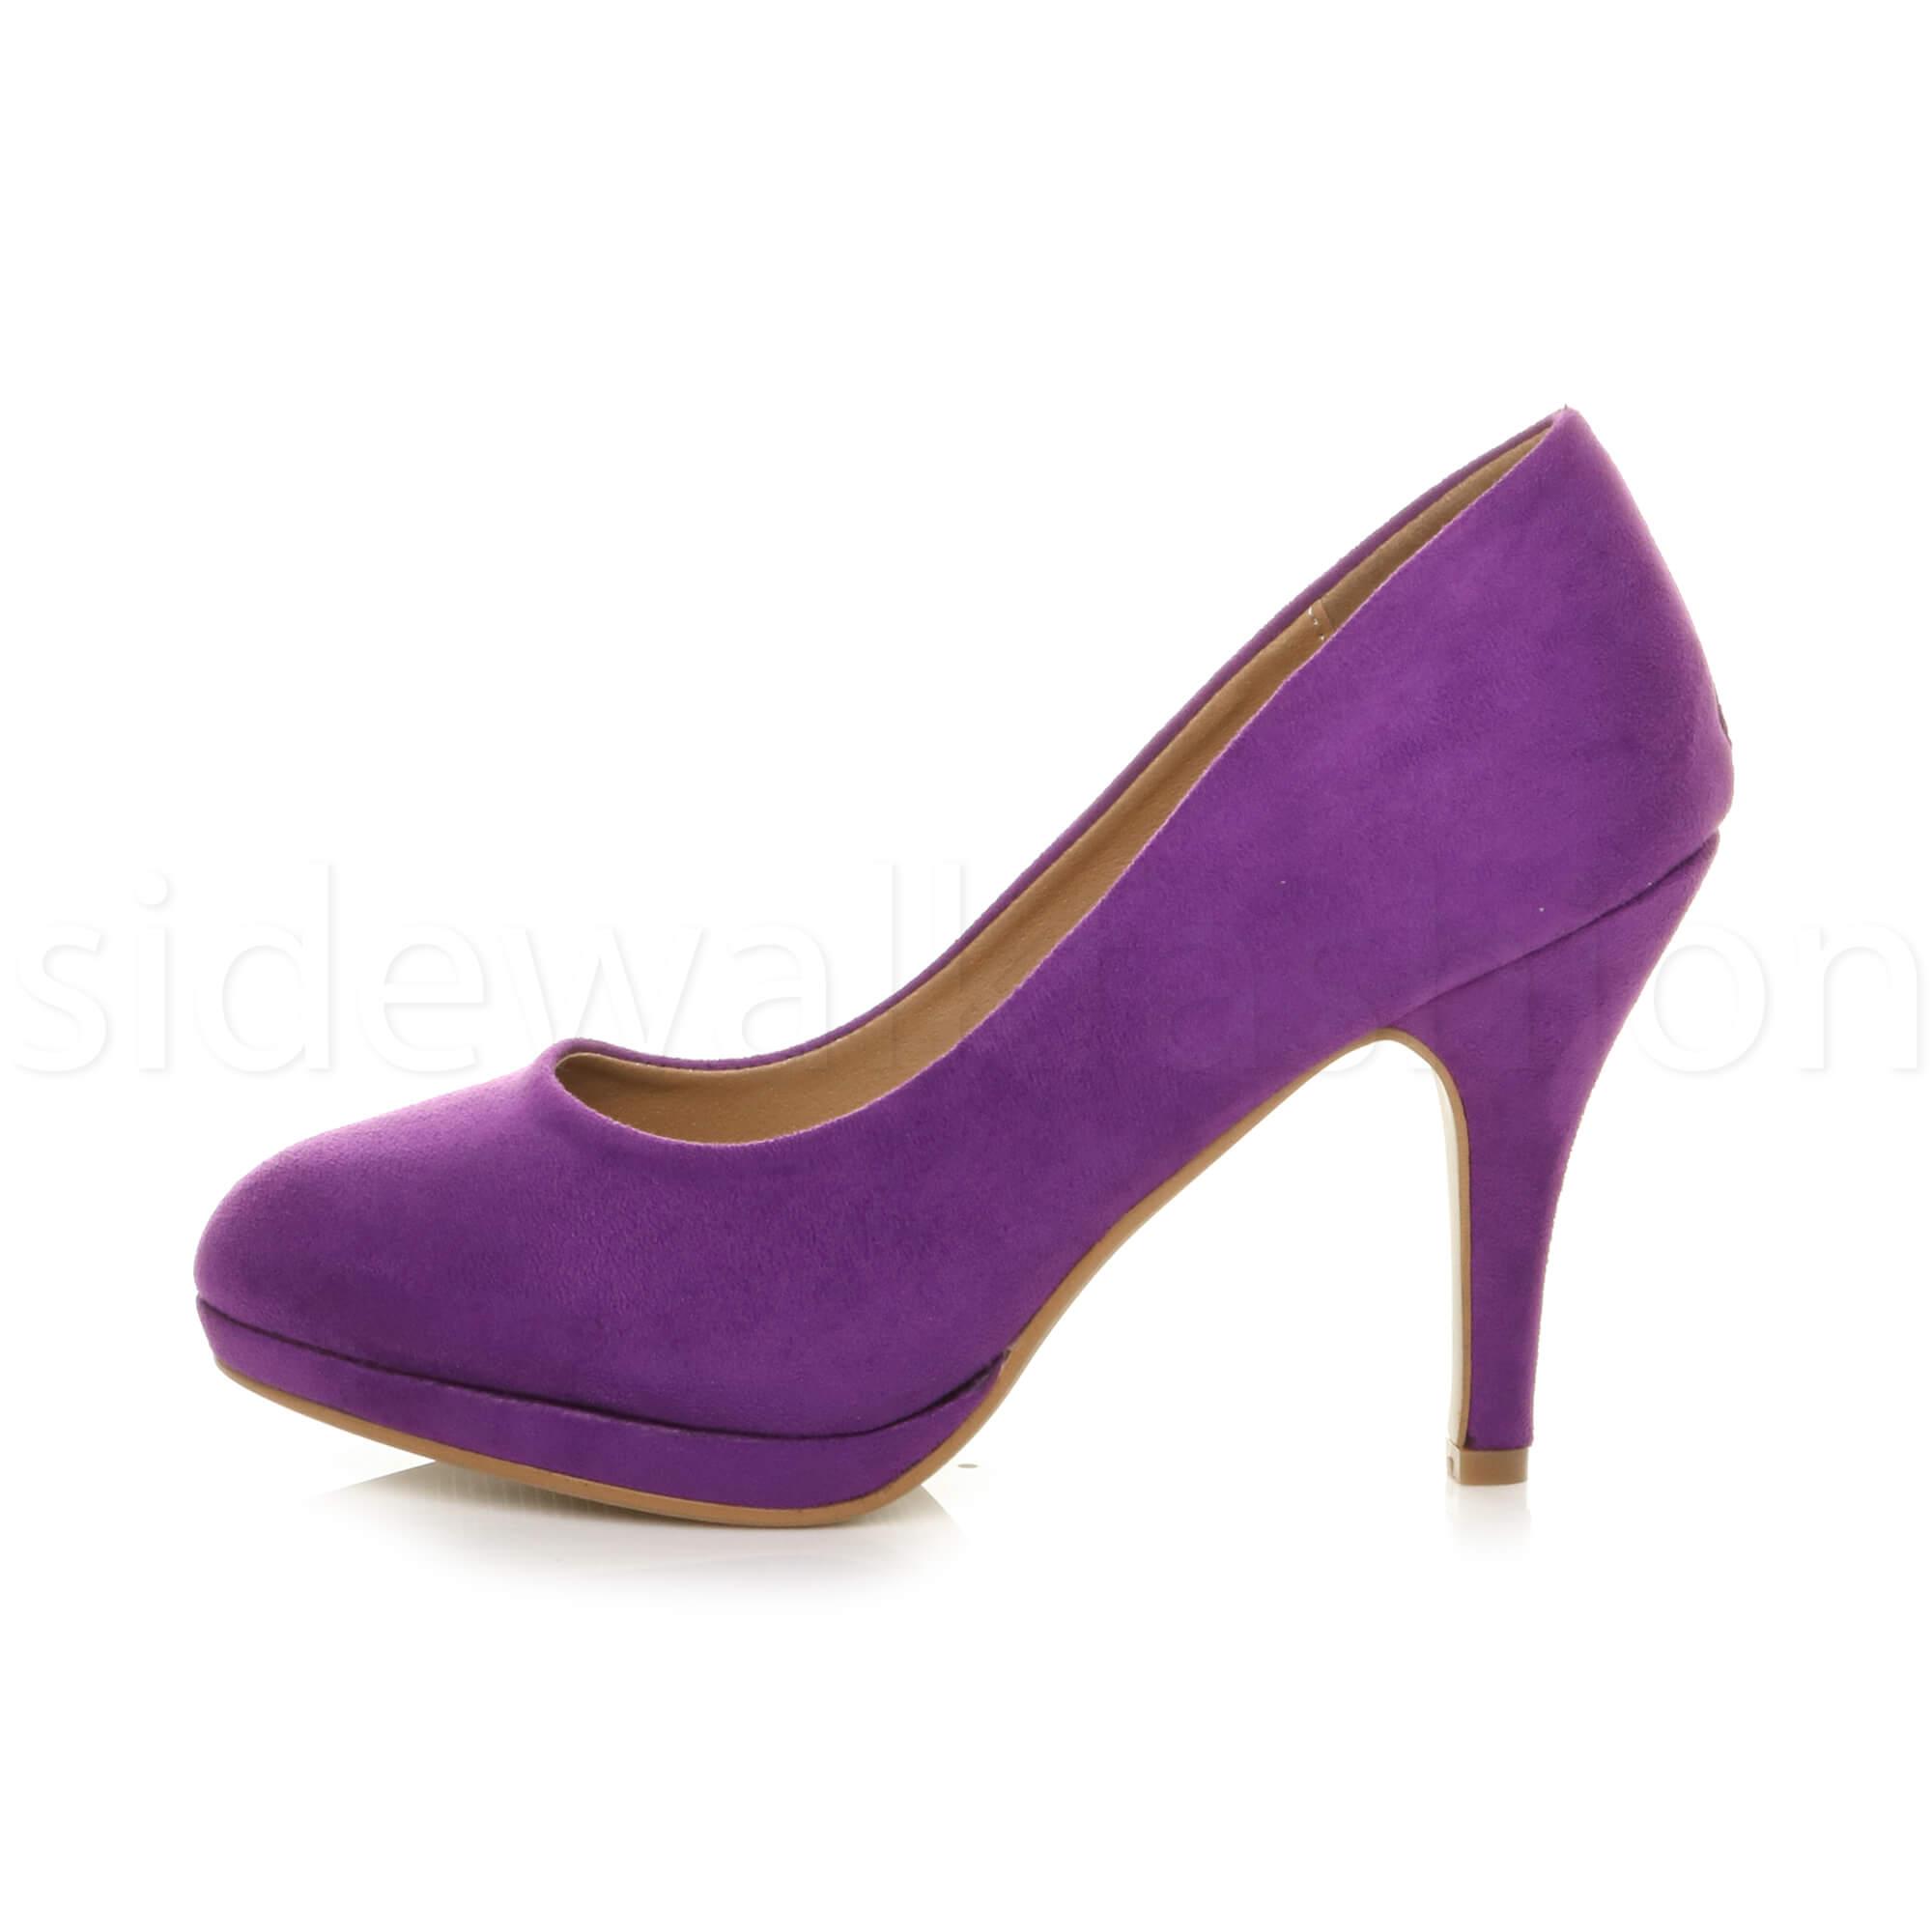 Womens-ladies-high-mid-heel-platform-wedding-evening-bridesmaid-court-shoes-size thumbnail 136